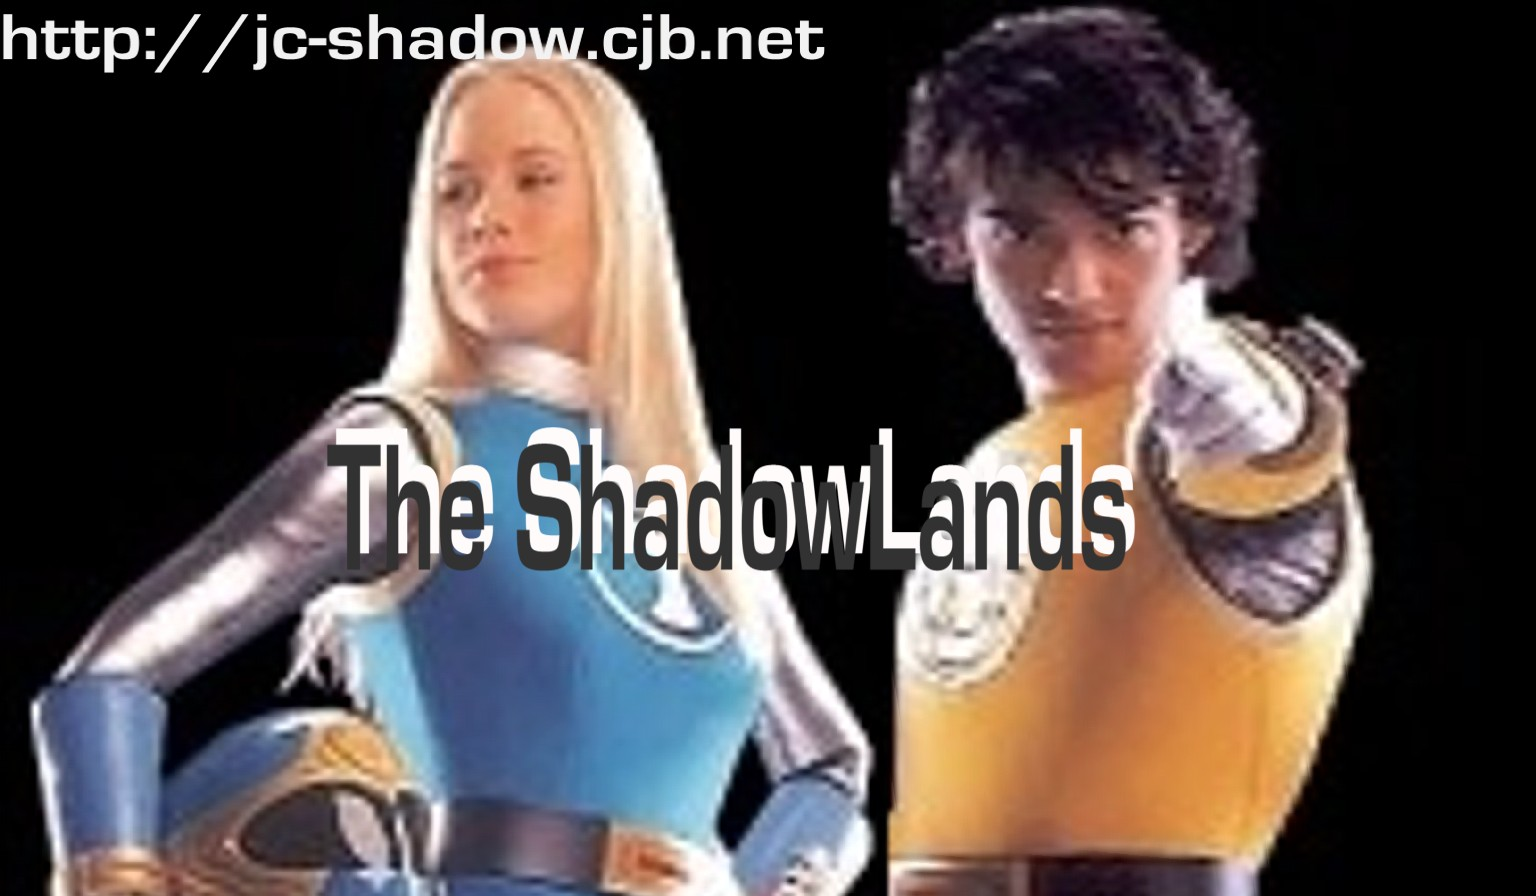 shadowlands.jpg